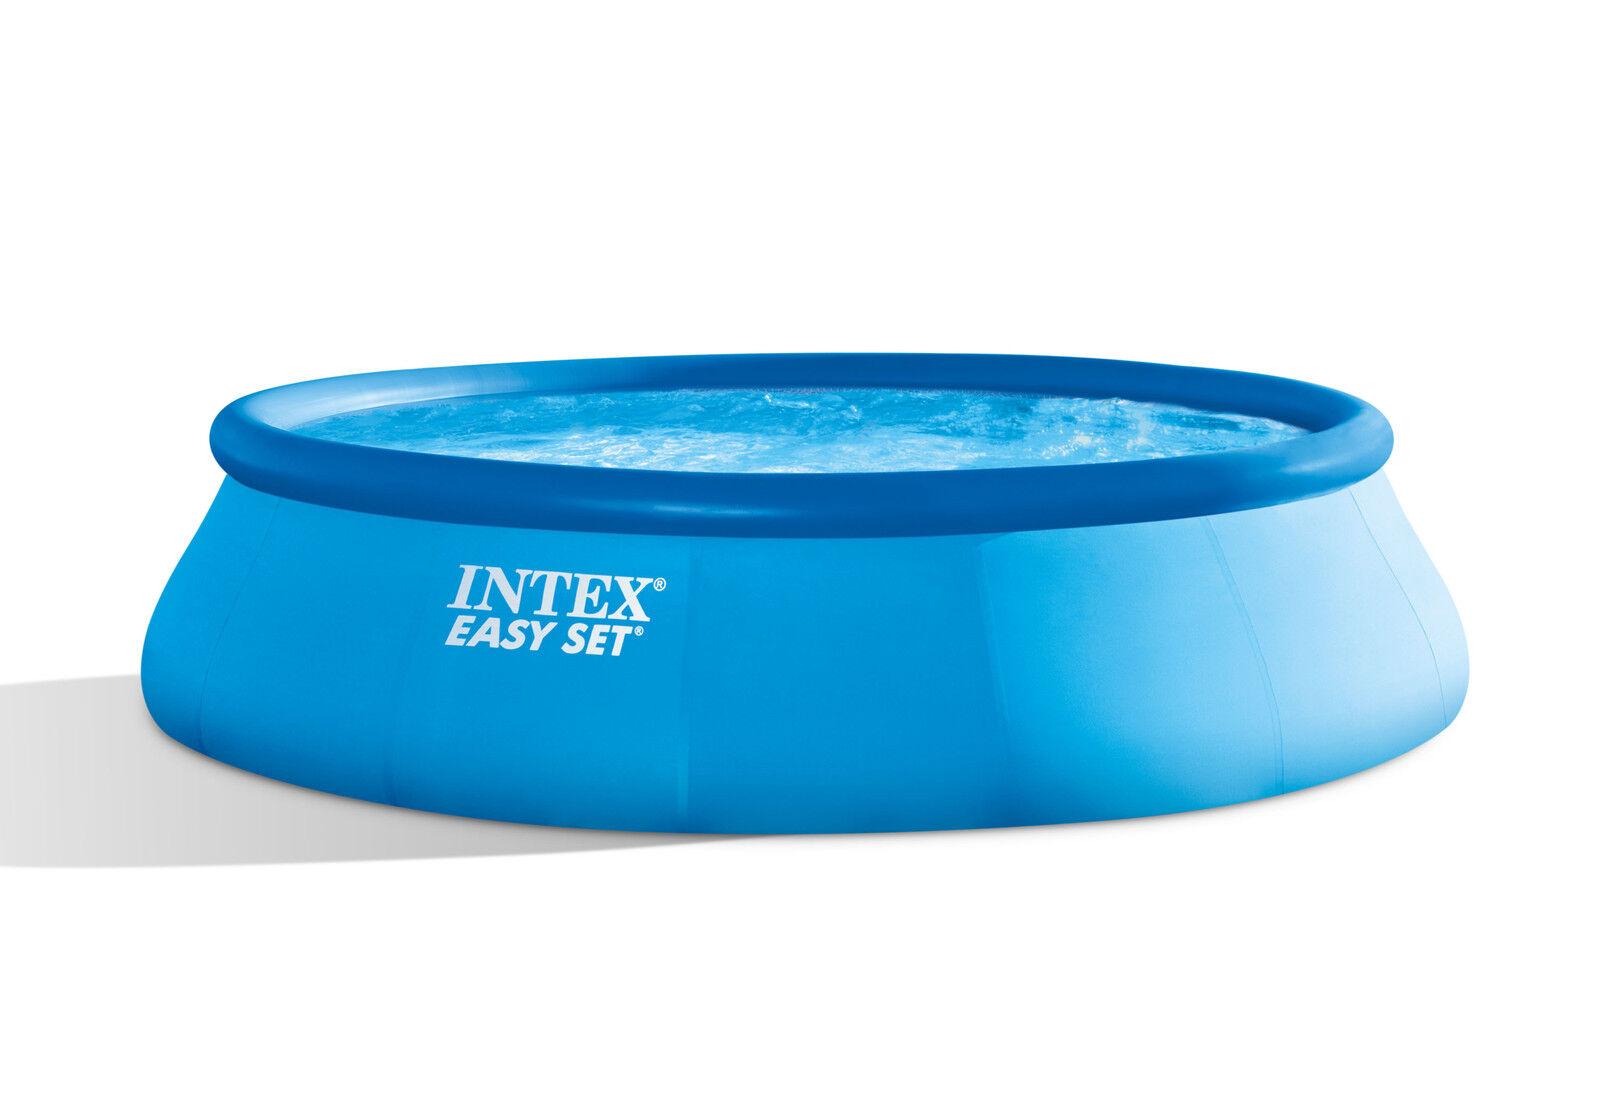 INTEX EASY SET POOLS ® Ø 396 x 84 cm 28142gn. resi merce SCATOLA DANNEGGIATA